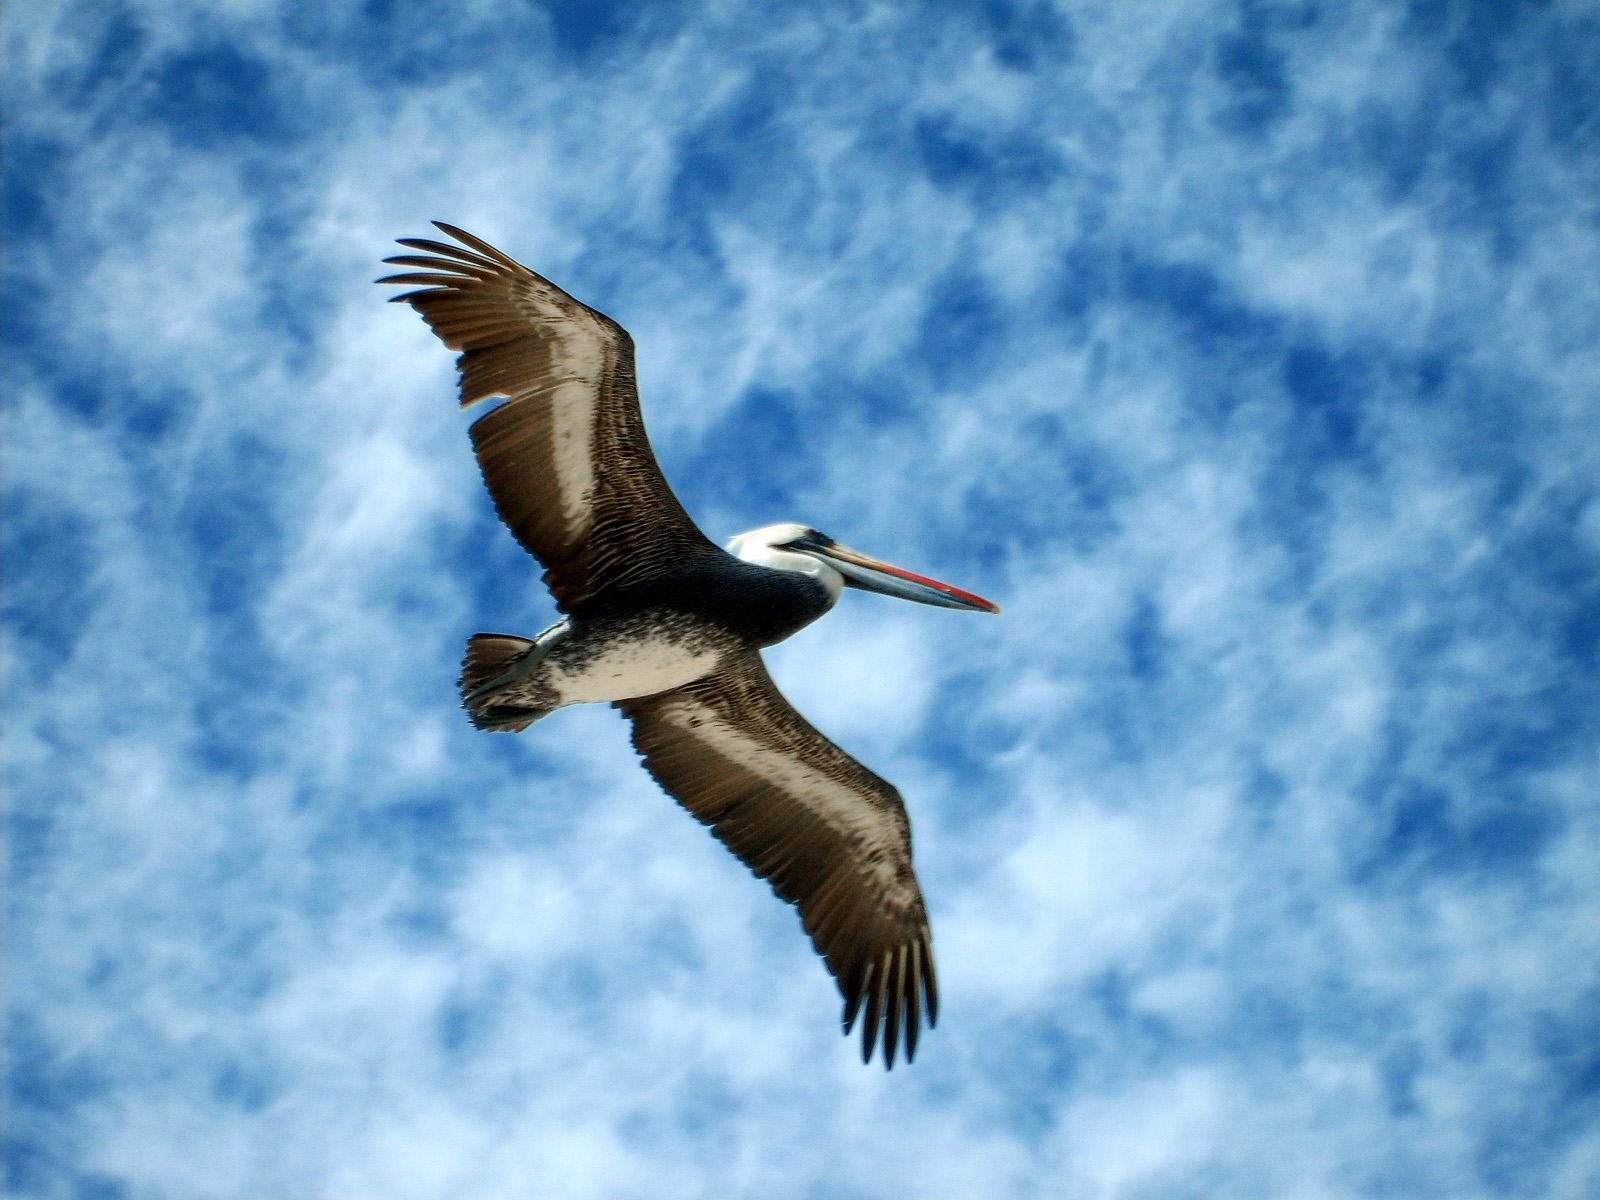 Fotos de natureza pelicano - Fotos de pelicanos ...